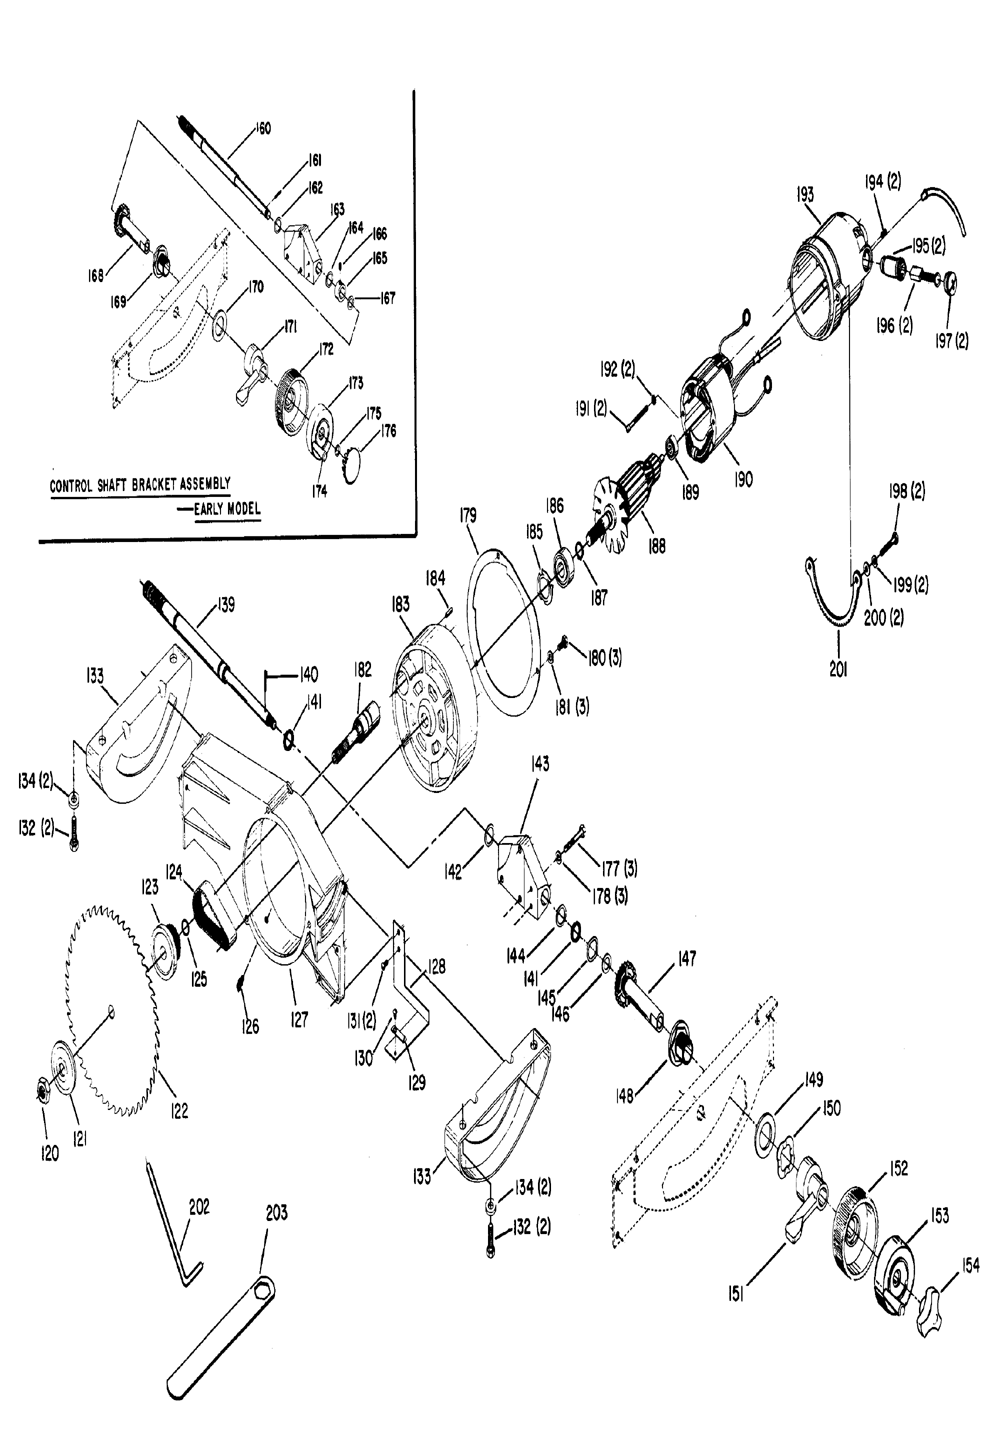 34-653-delta-PB-1Break Down